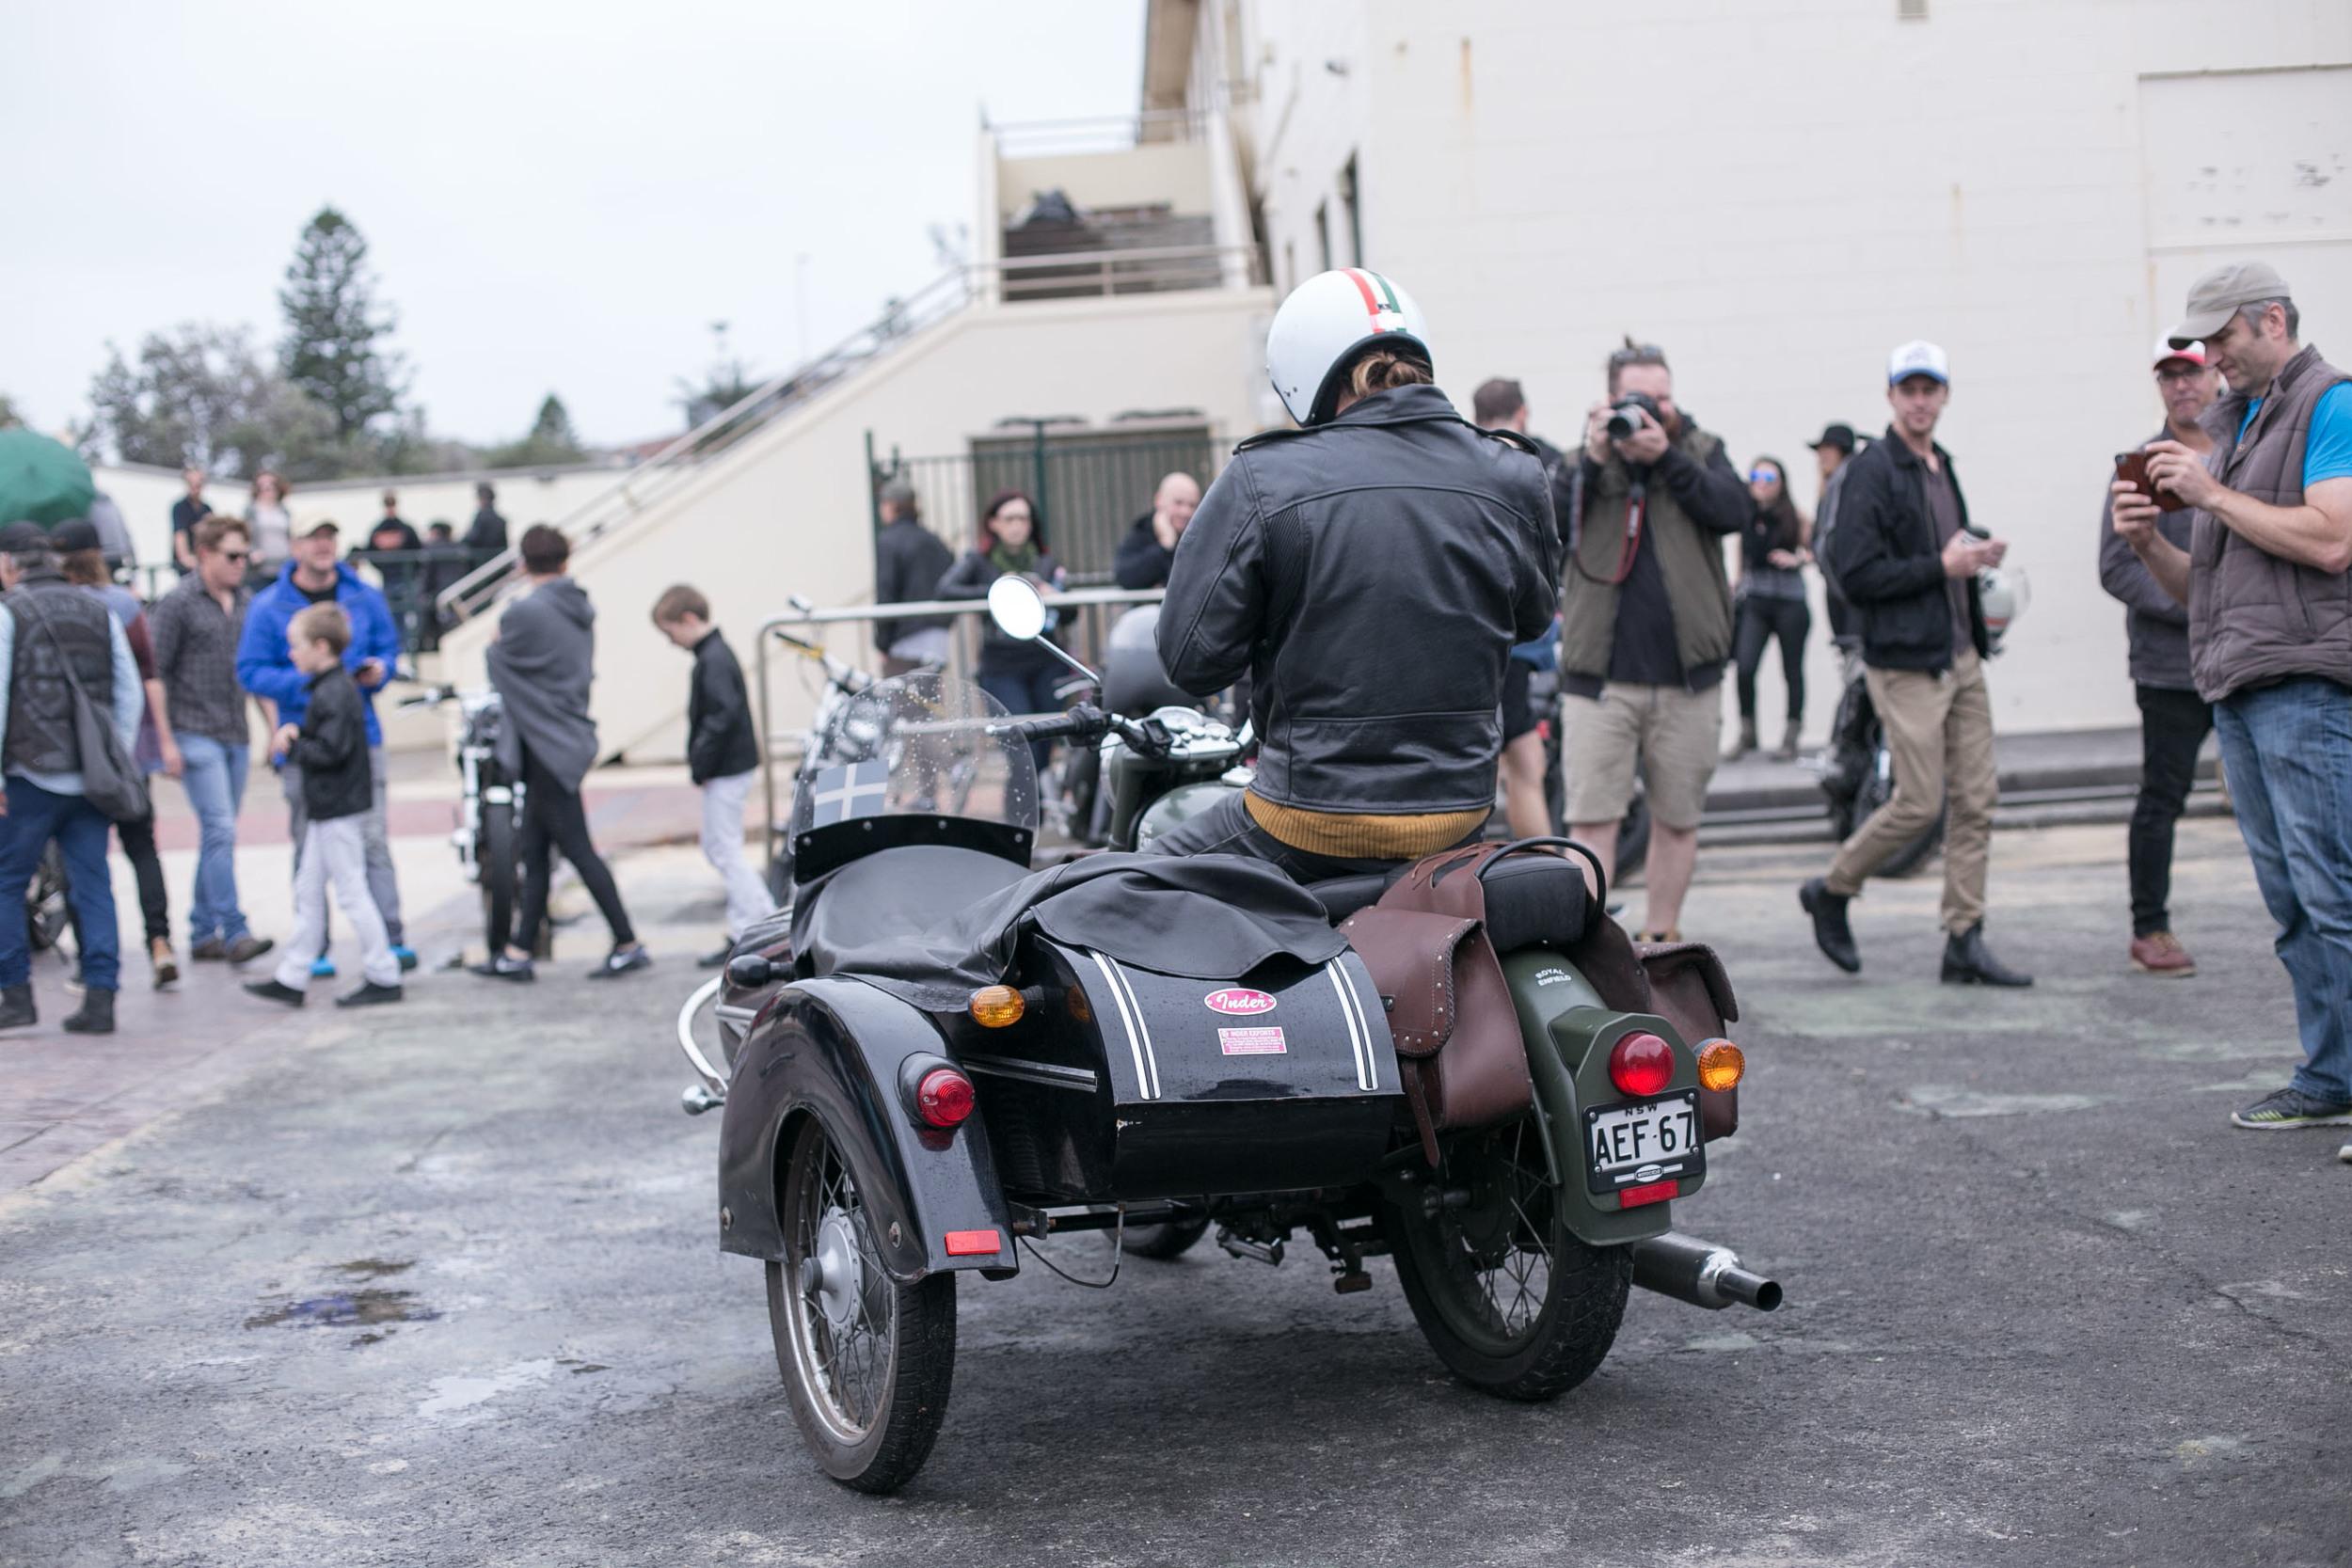 Rising_sun_workshop_deus_bike_build_off_sydney-55.jpg